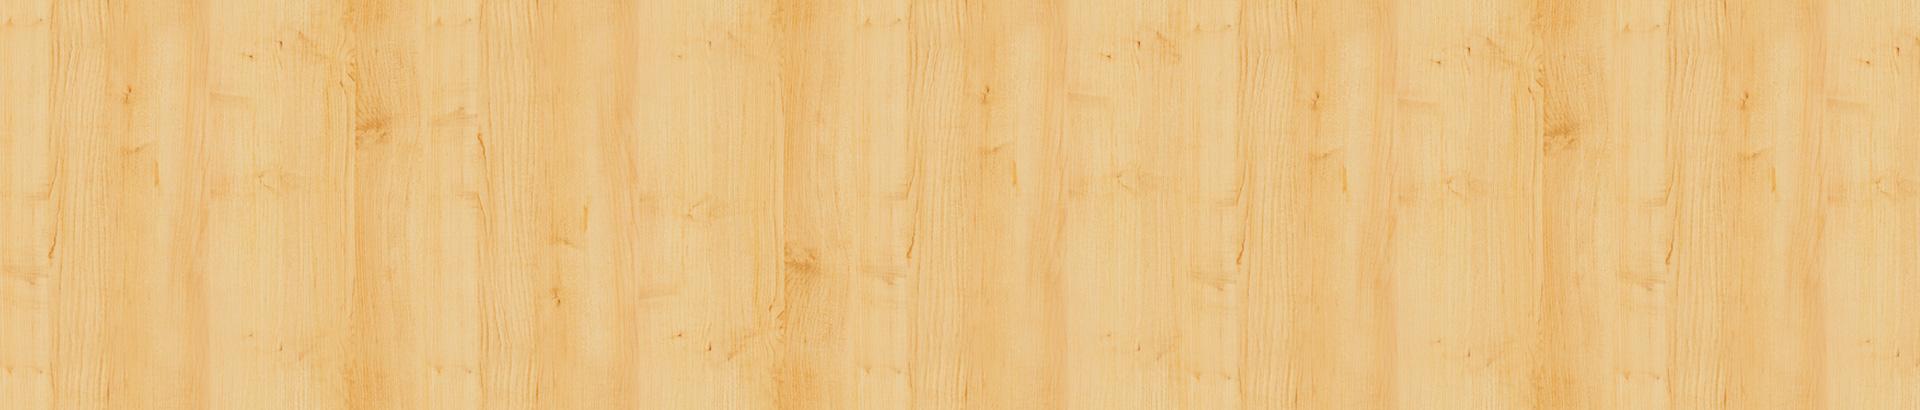 woodslide